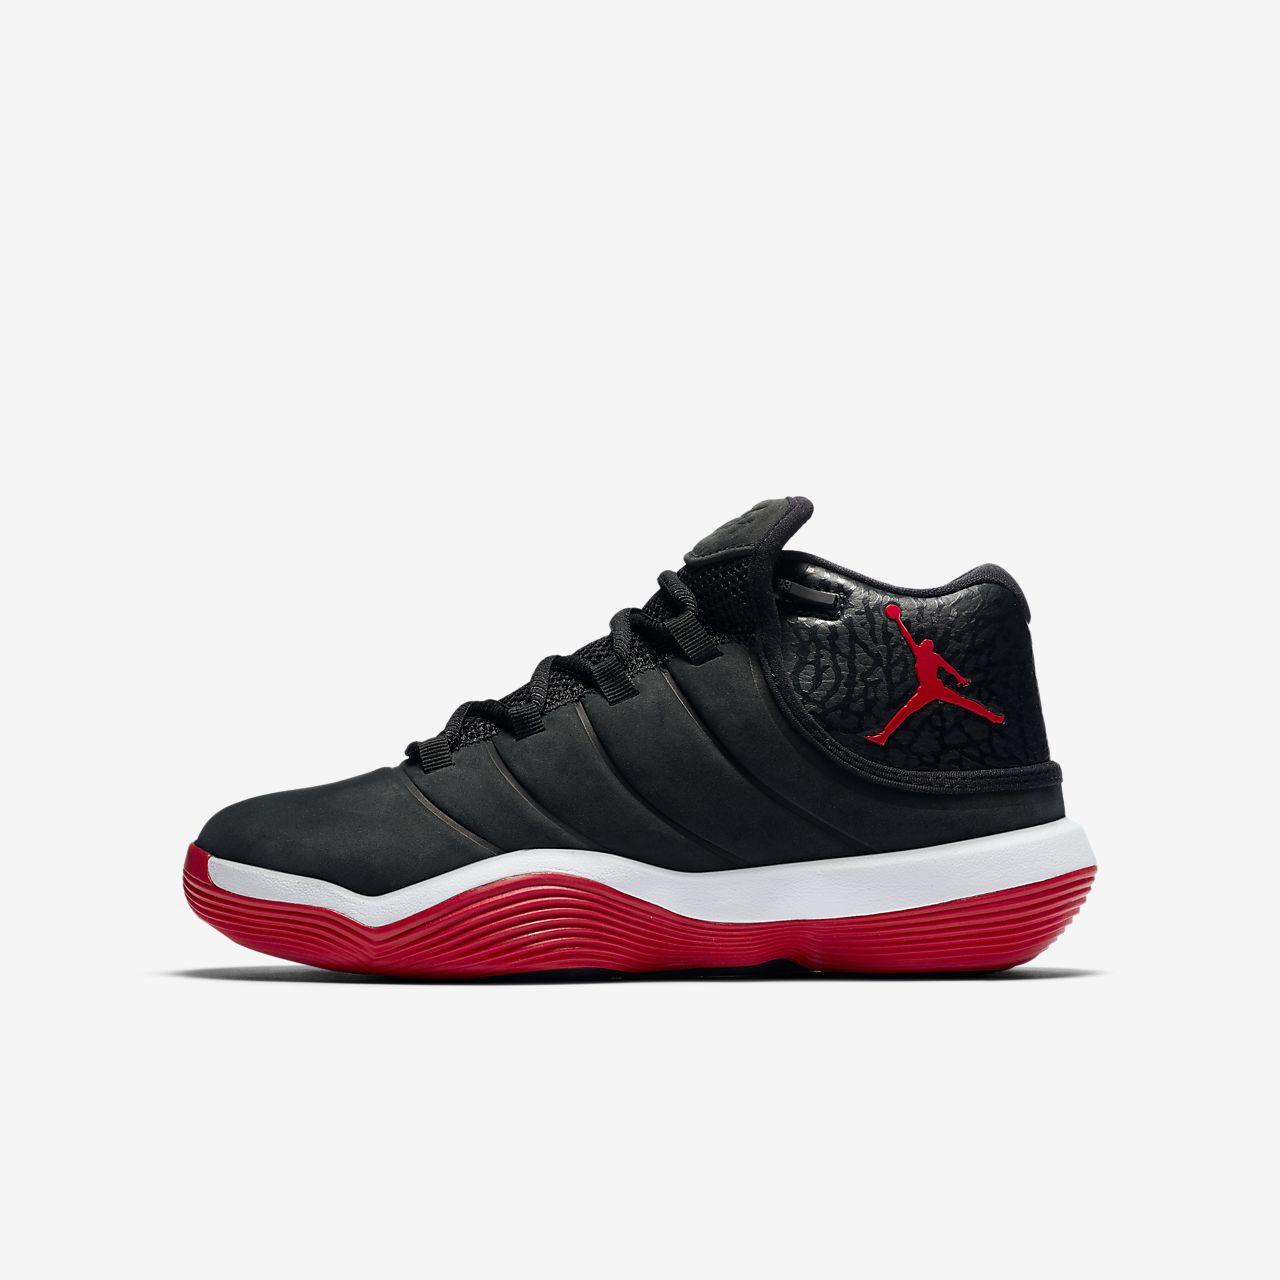 chaussure de basketball jordan super fly 2017 pour enfant. Black Bedroom Furniture Sets. Home Design Ideas